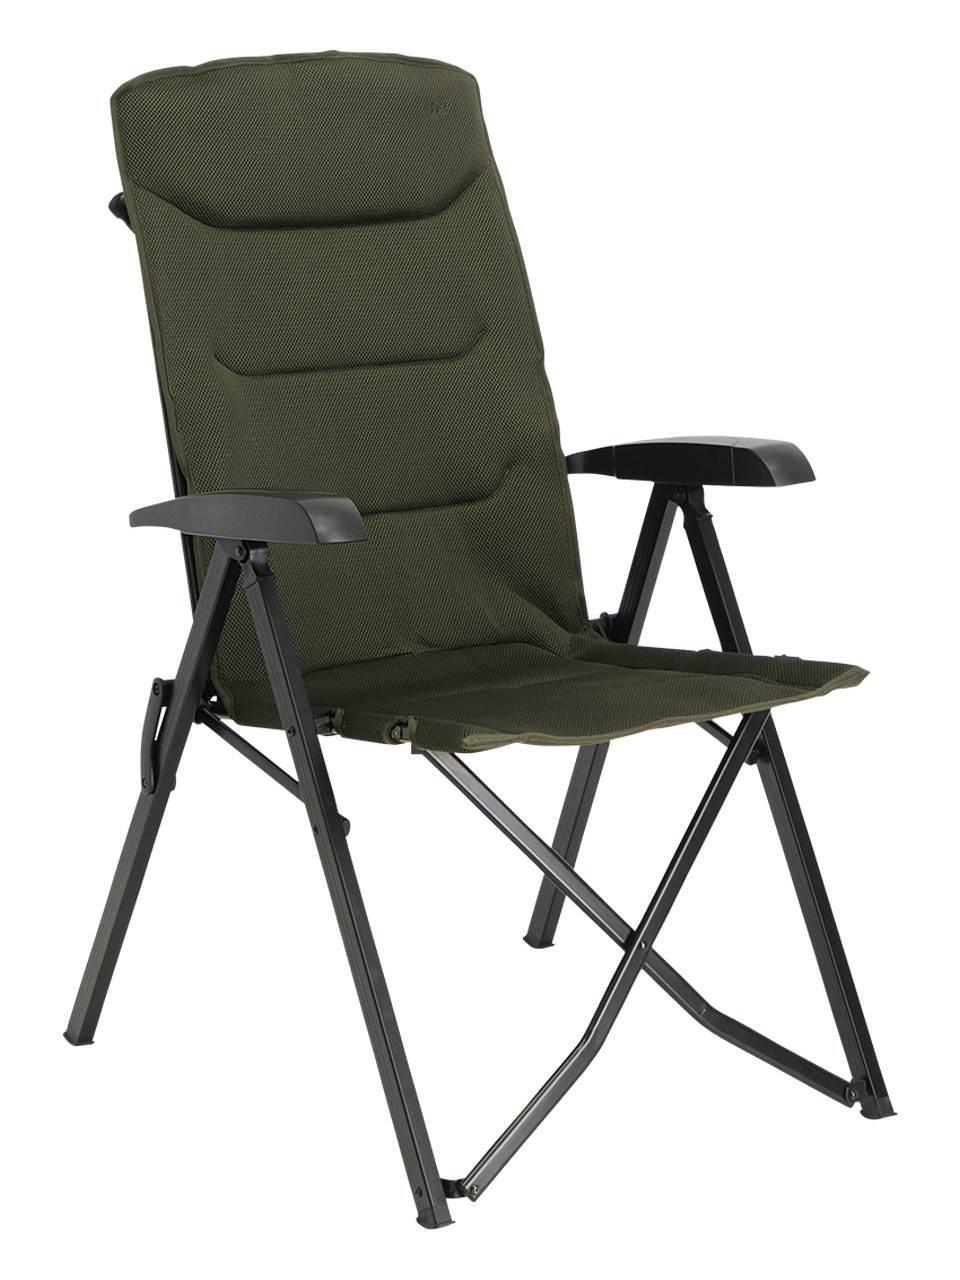 Human Nature - campingstoel opvouwbaar – 3D - Leden